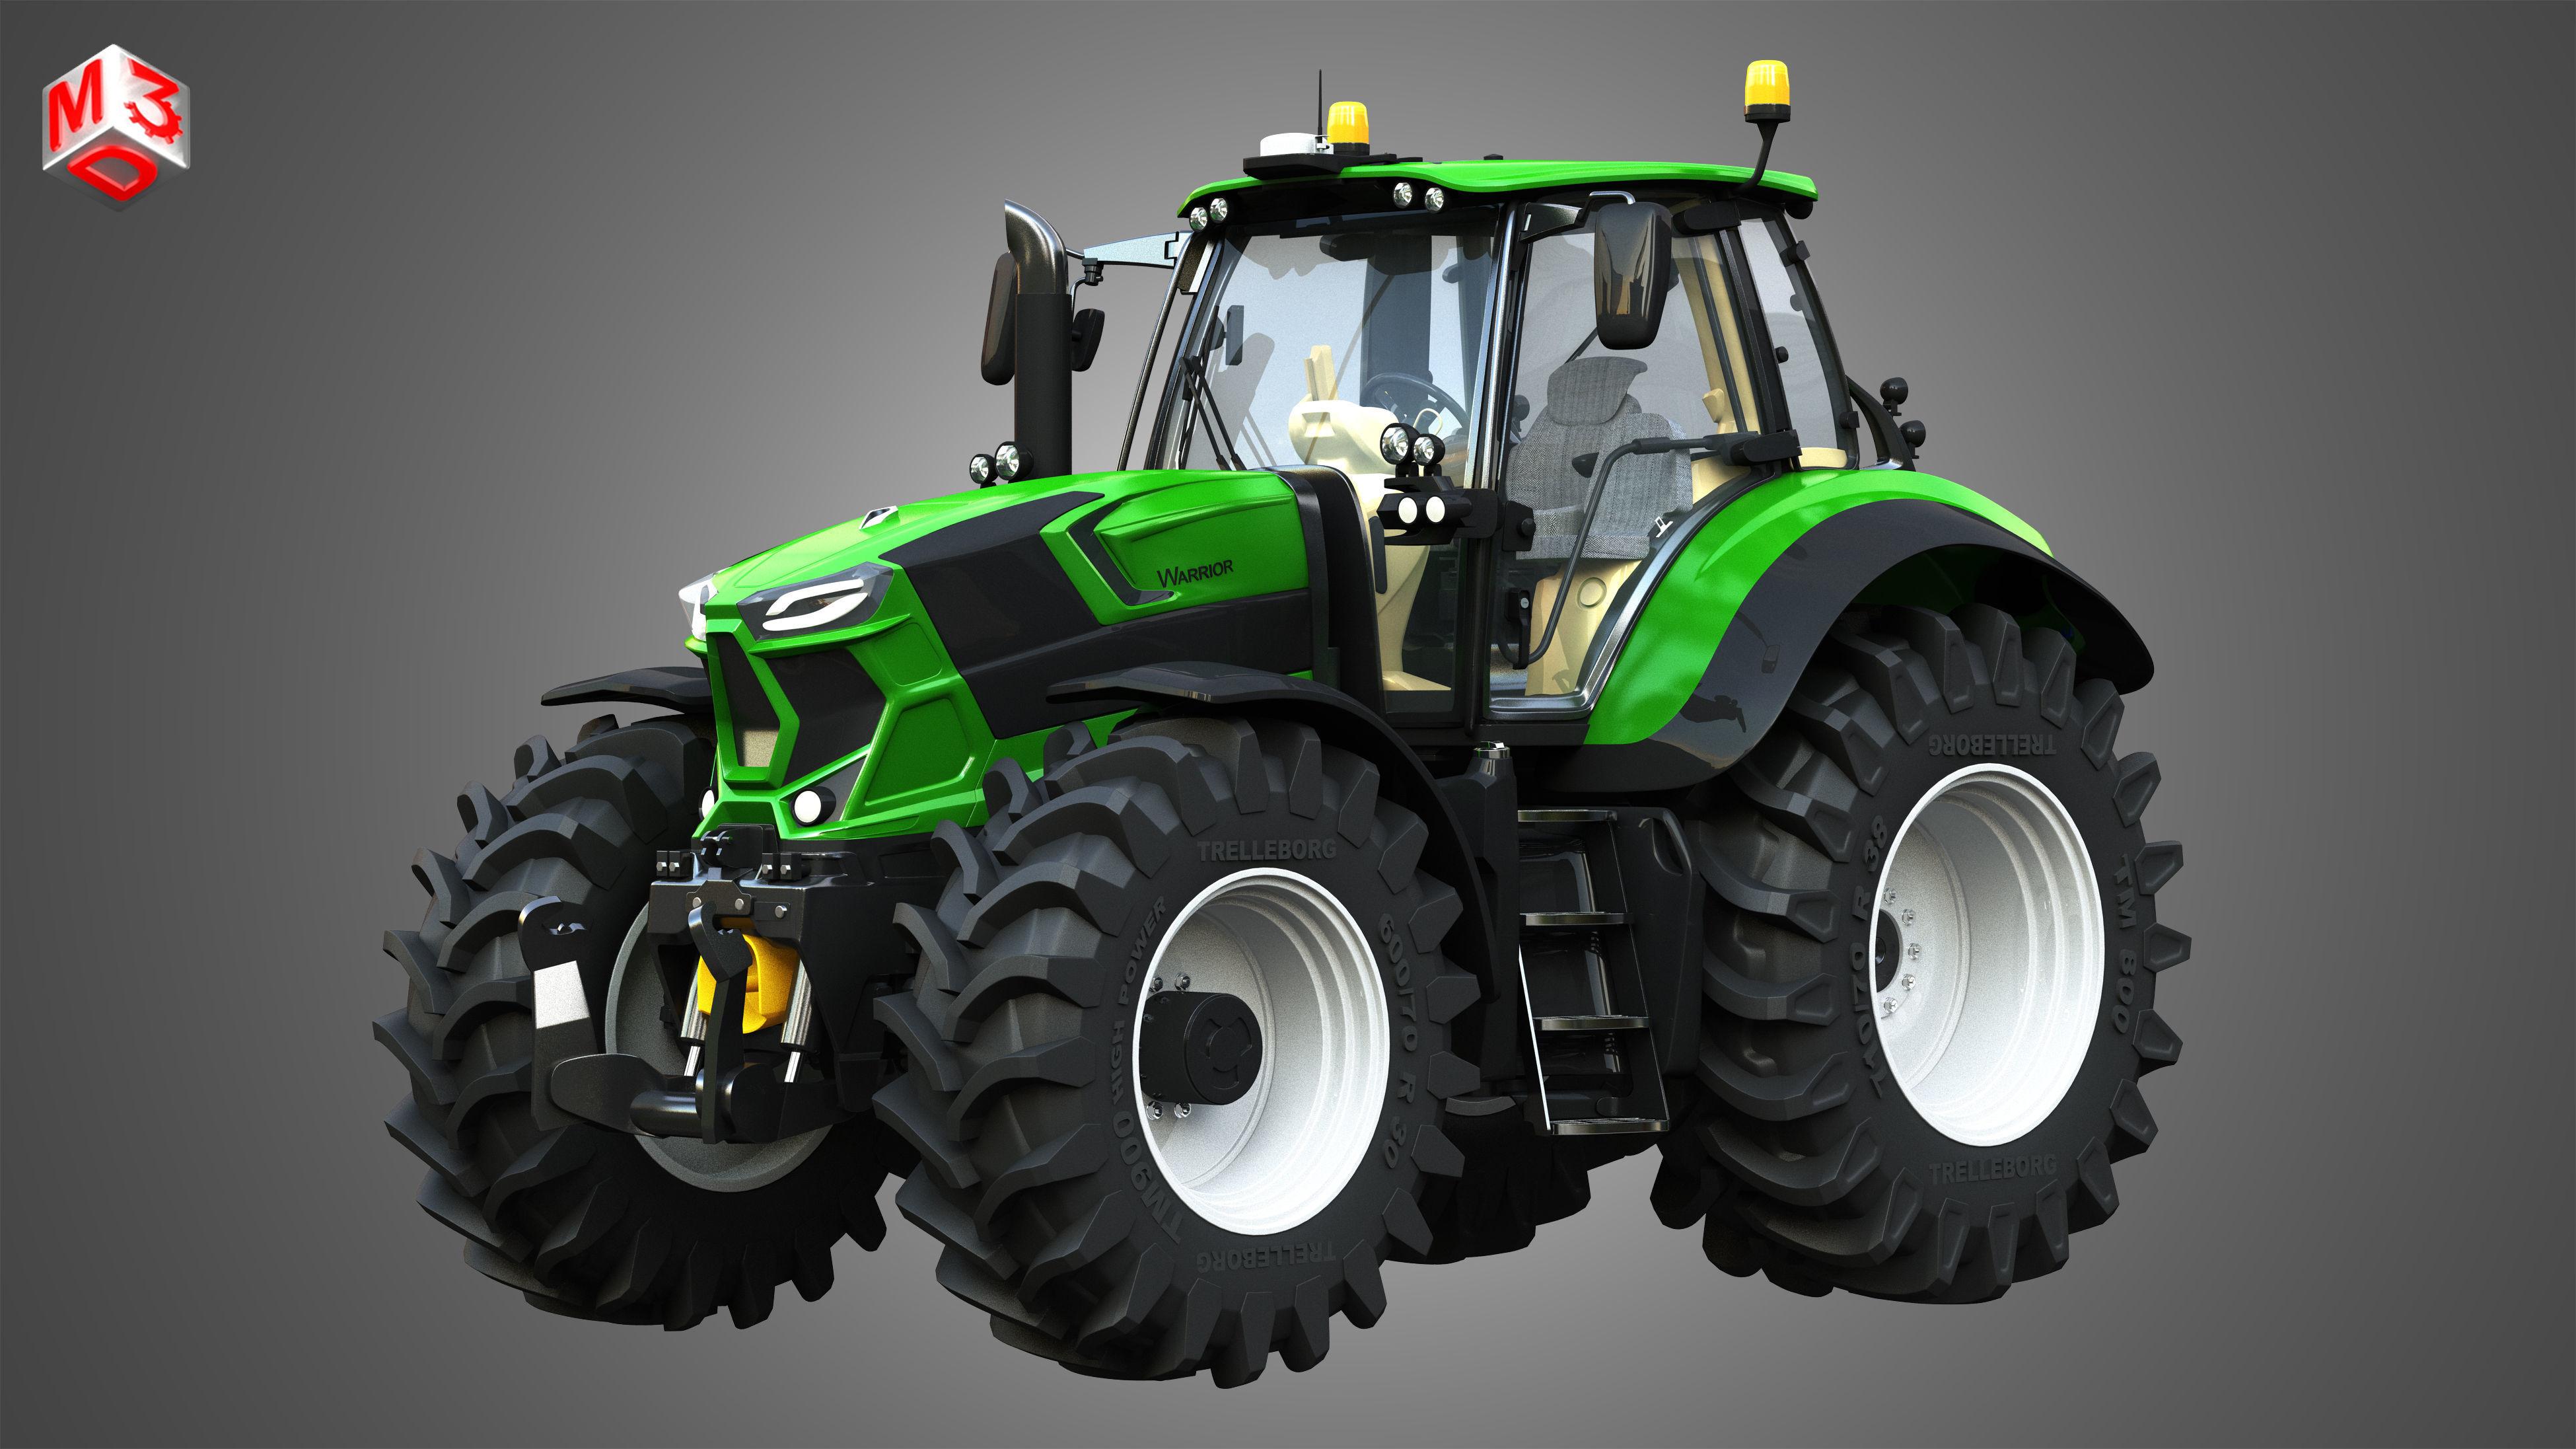 Deutz - Fahr 7 Series - 8280 TTV Tractor